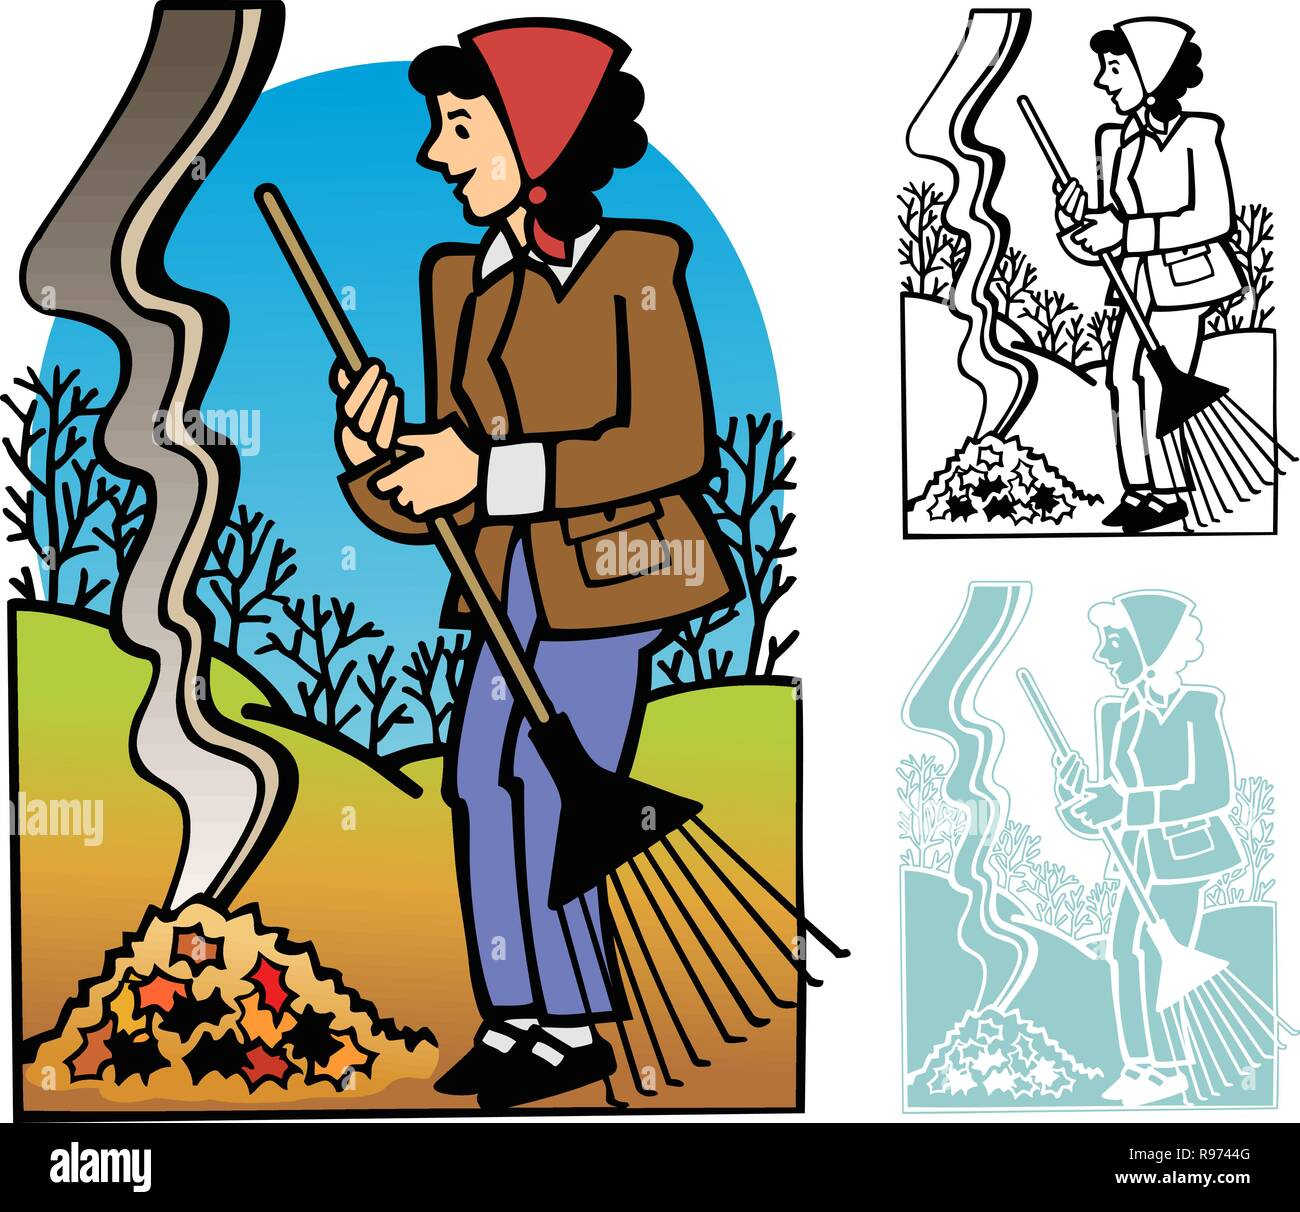 hight resolution of woman raking and burning fallen leaves